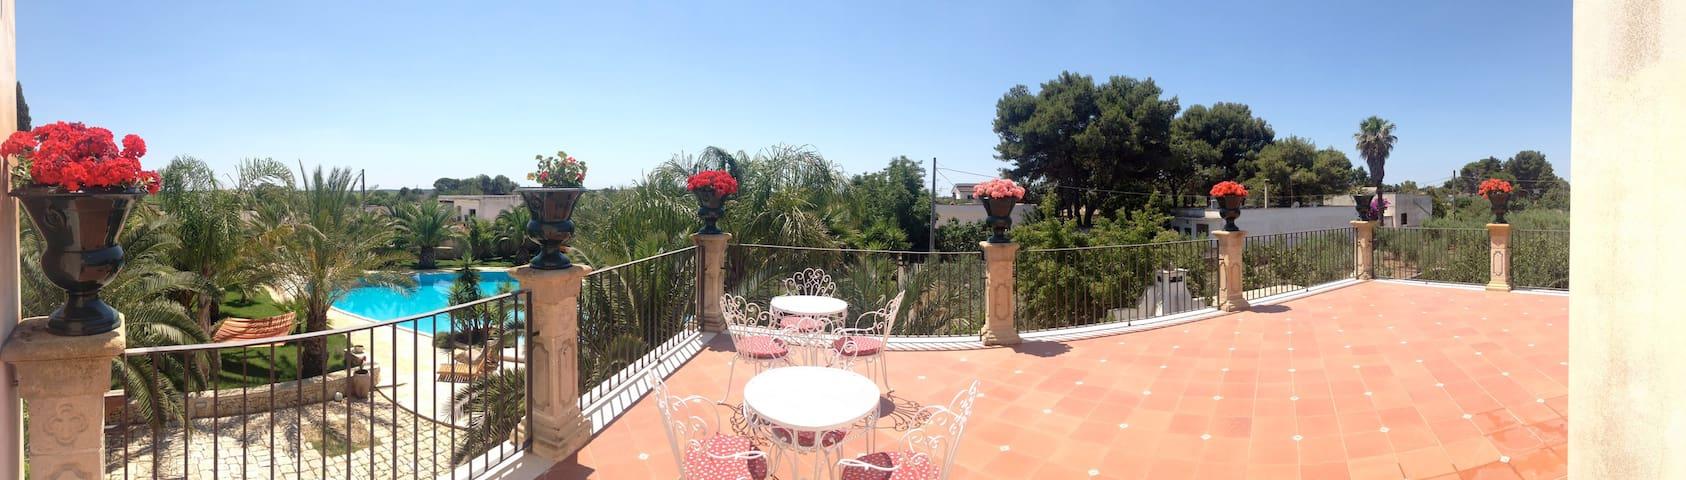 Villa Torre Bianca  Salento  Puglia - Manduria - Casa de campo